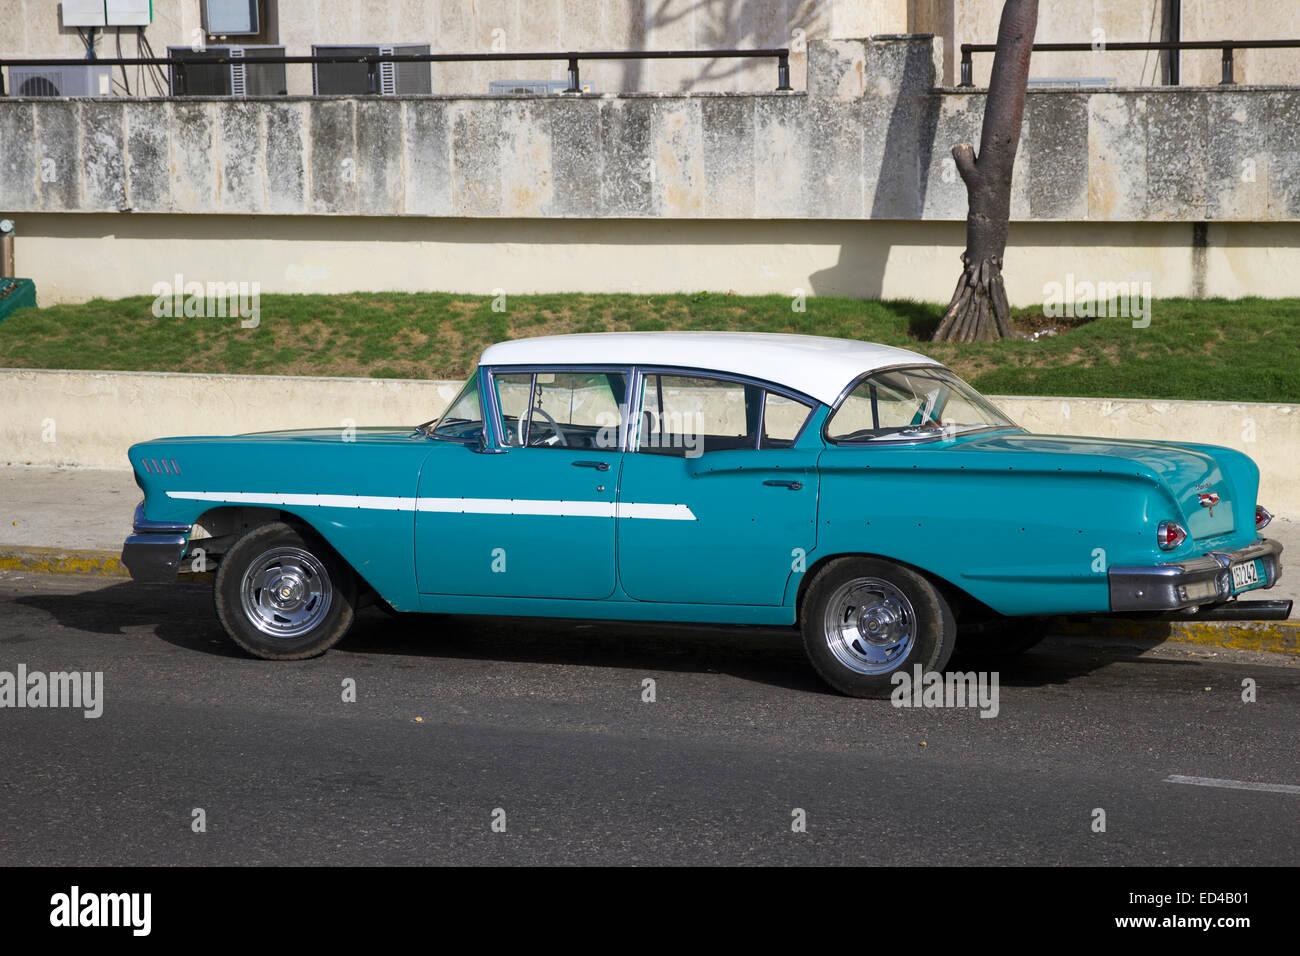 Classic Chevy Cars in Havana Cuba Stock Photo: 76928433 - Alamy